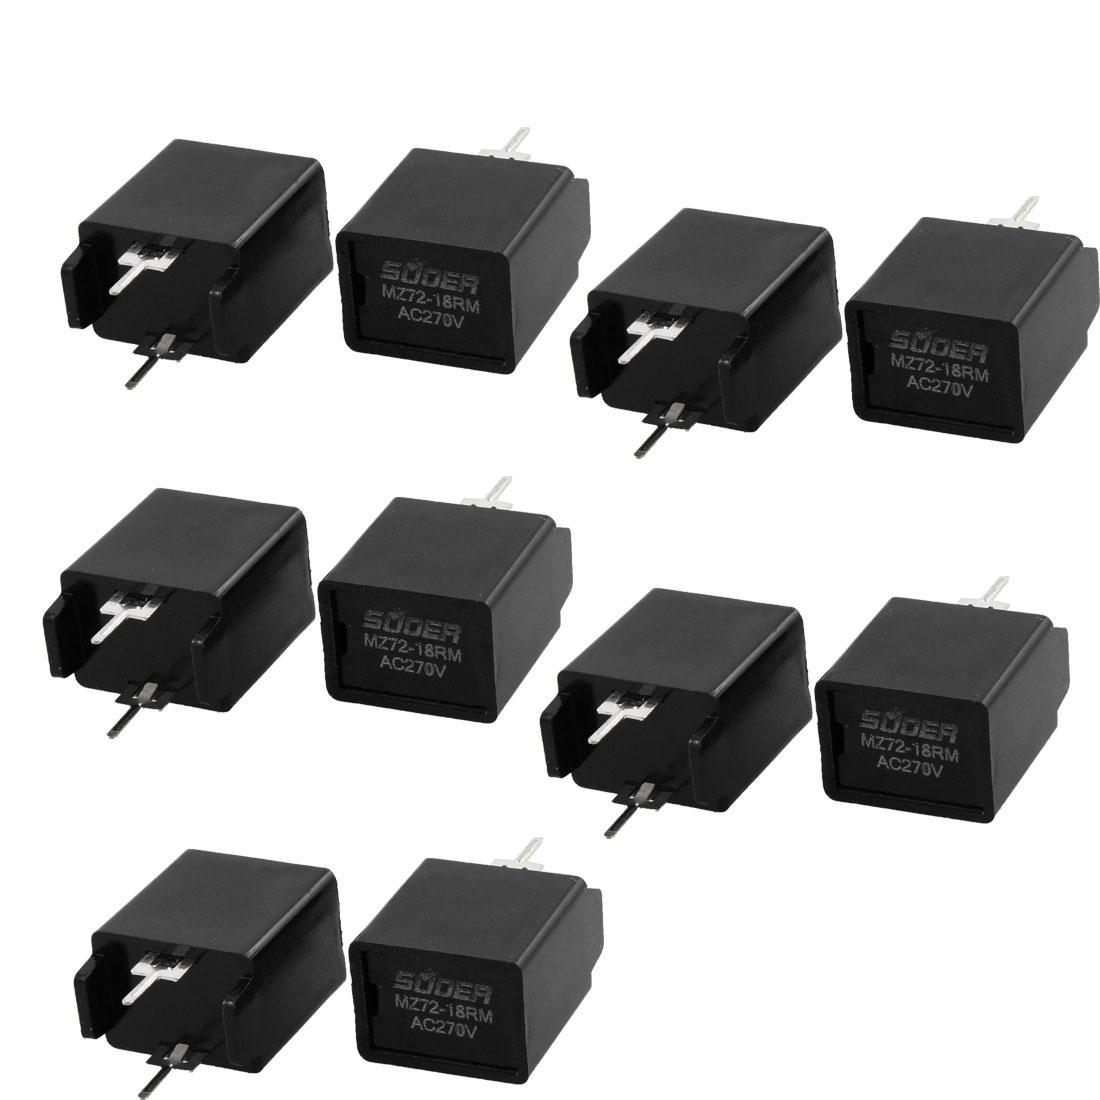 MZ72-18RM 18 Ohm AC 270V 2 Pin Black Degaussing Resistor CRT 10 Pcs